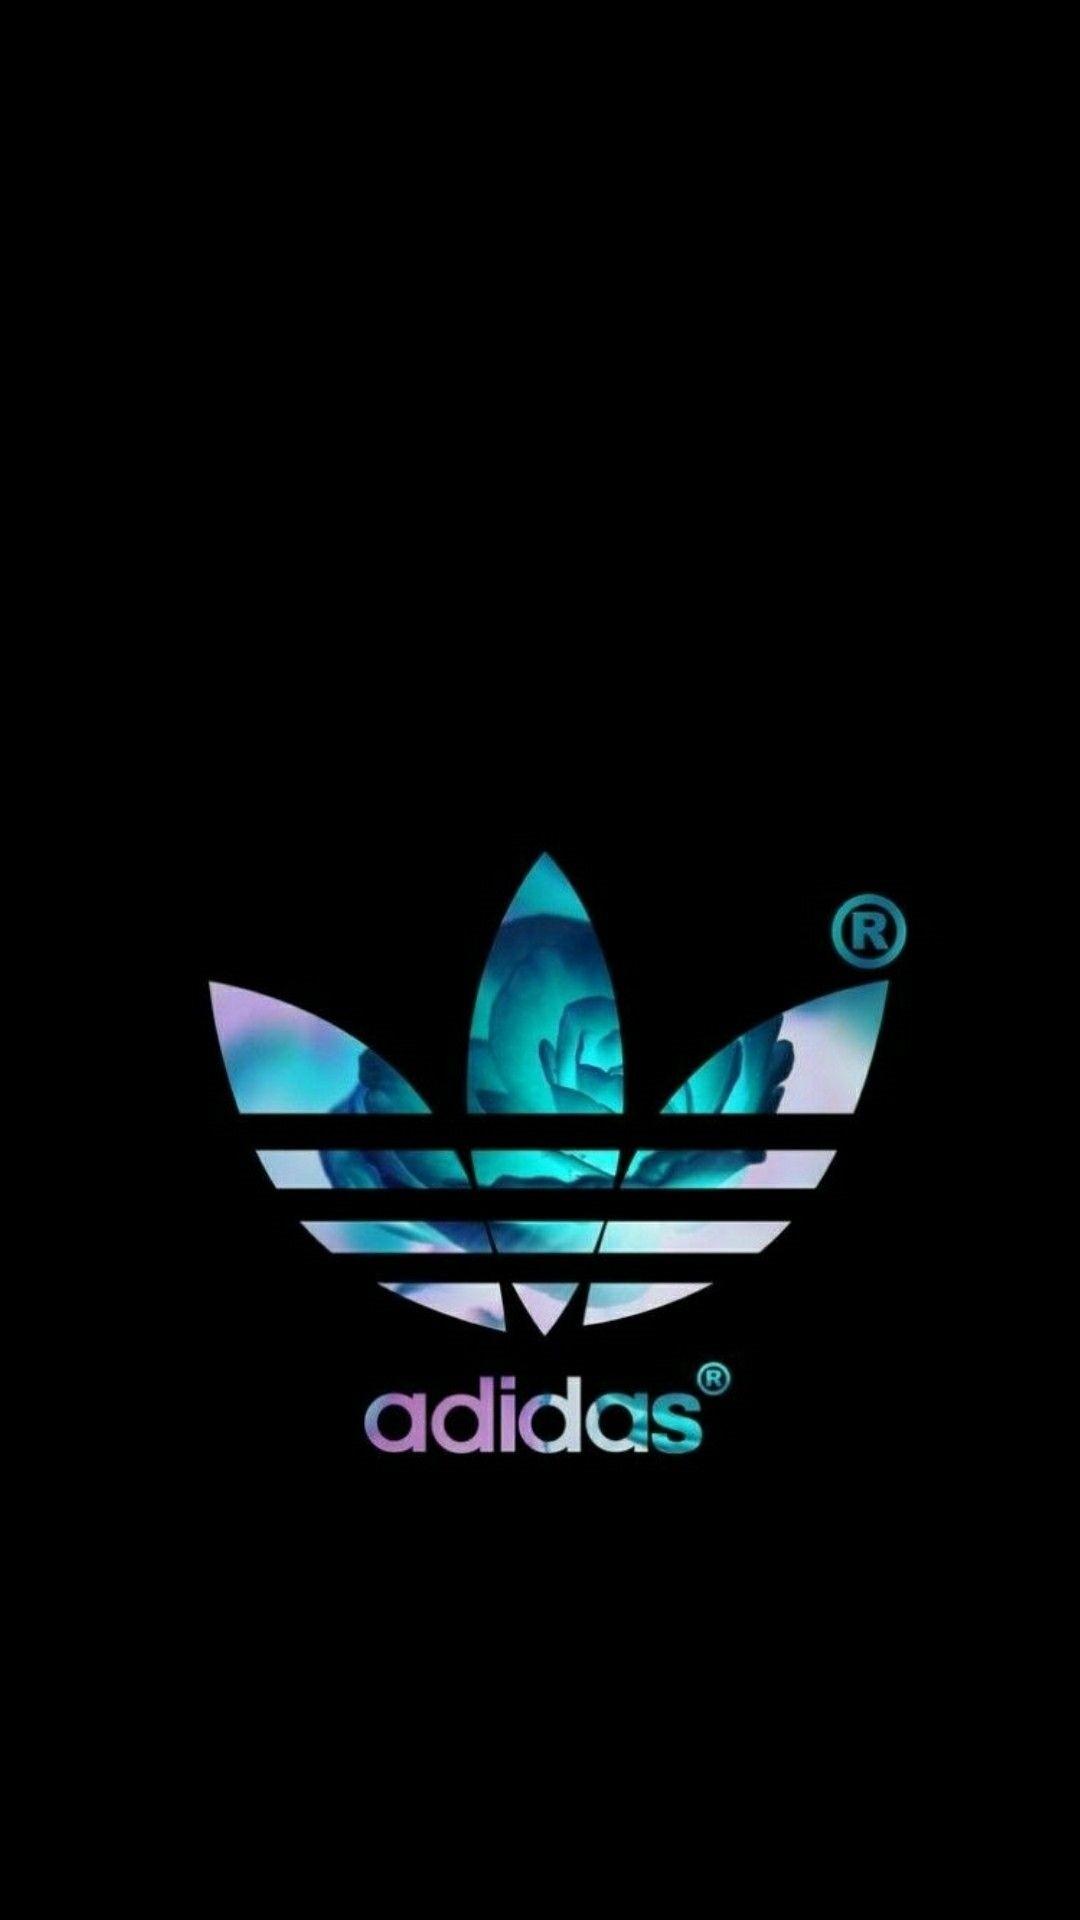 Black Adidas iPhone 5 wallpaper